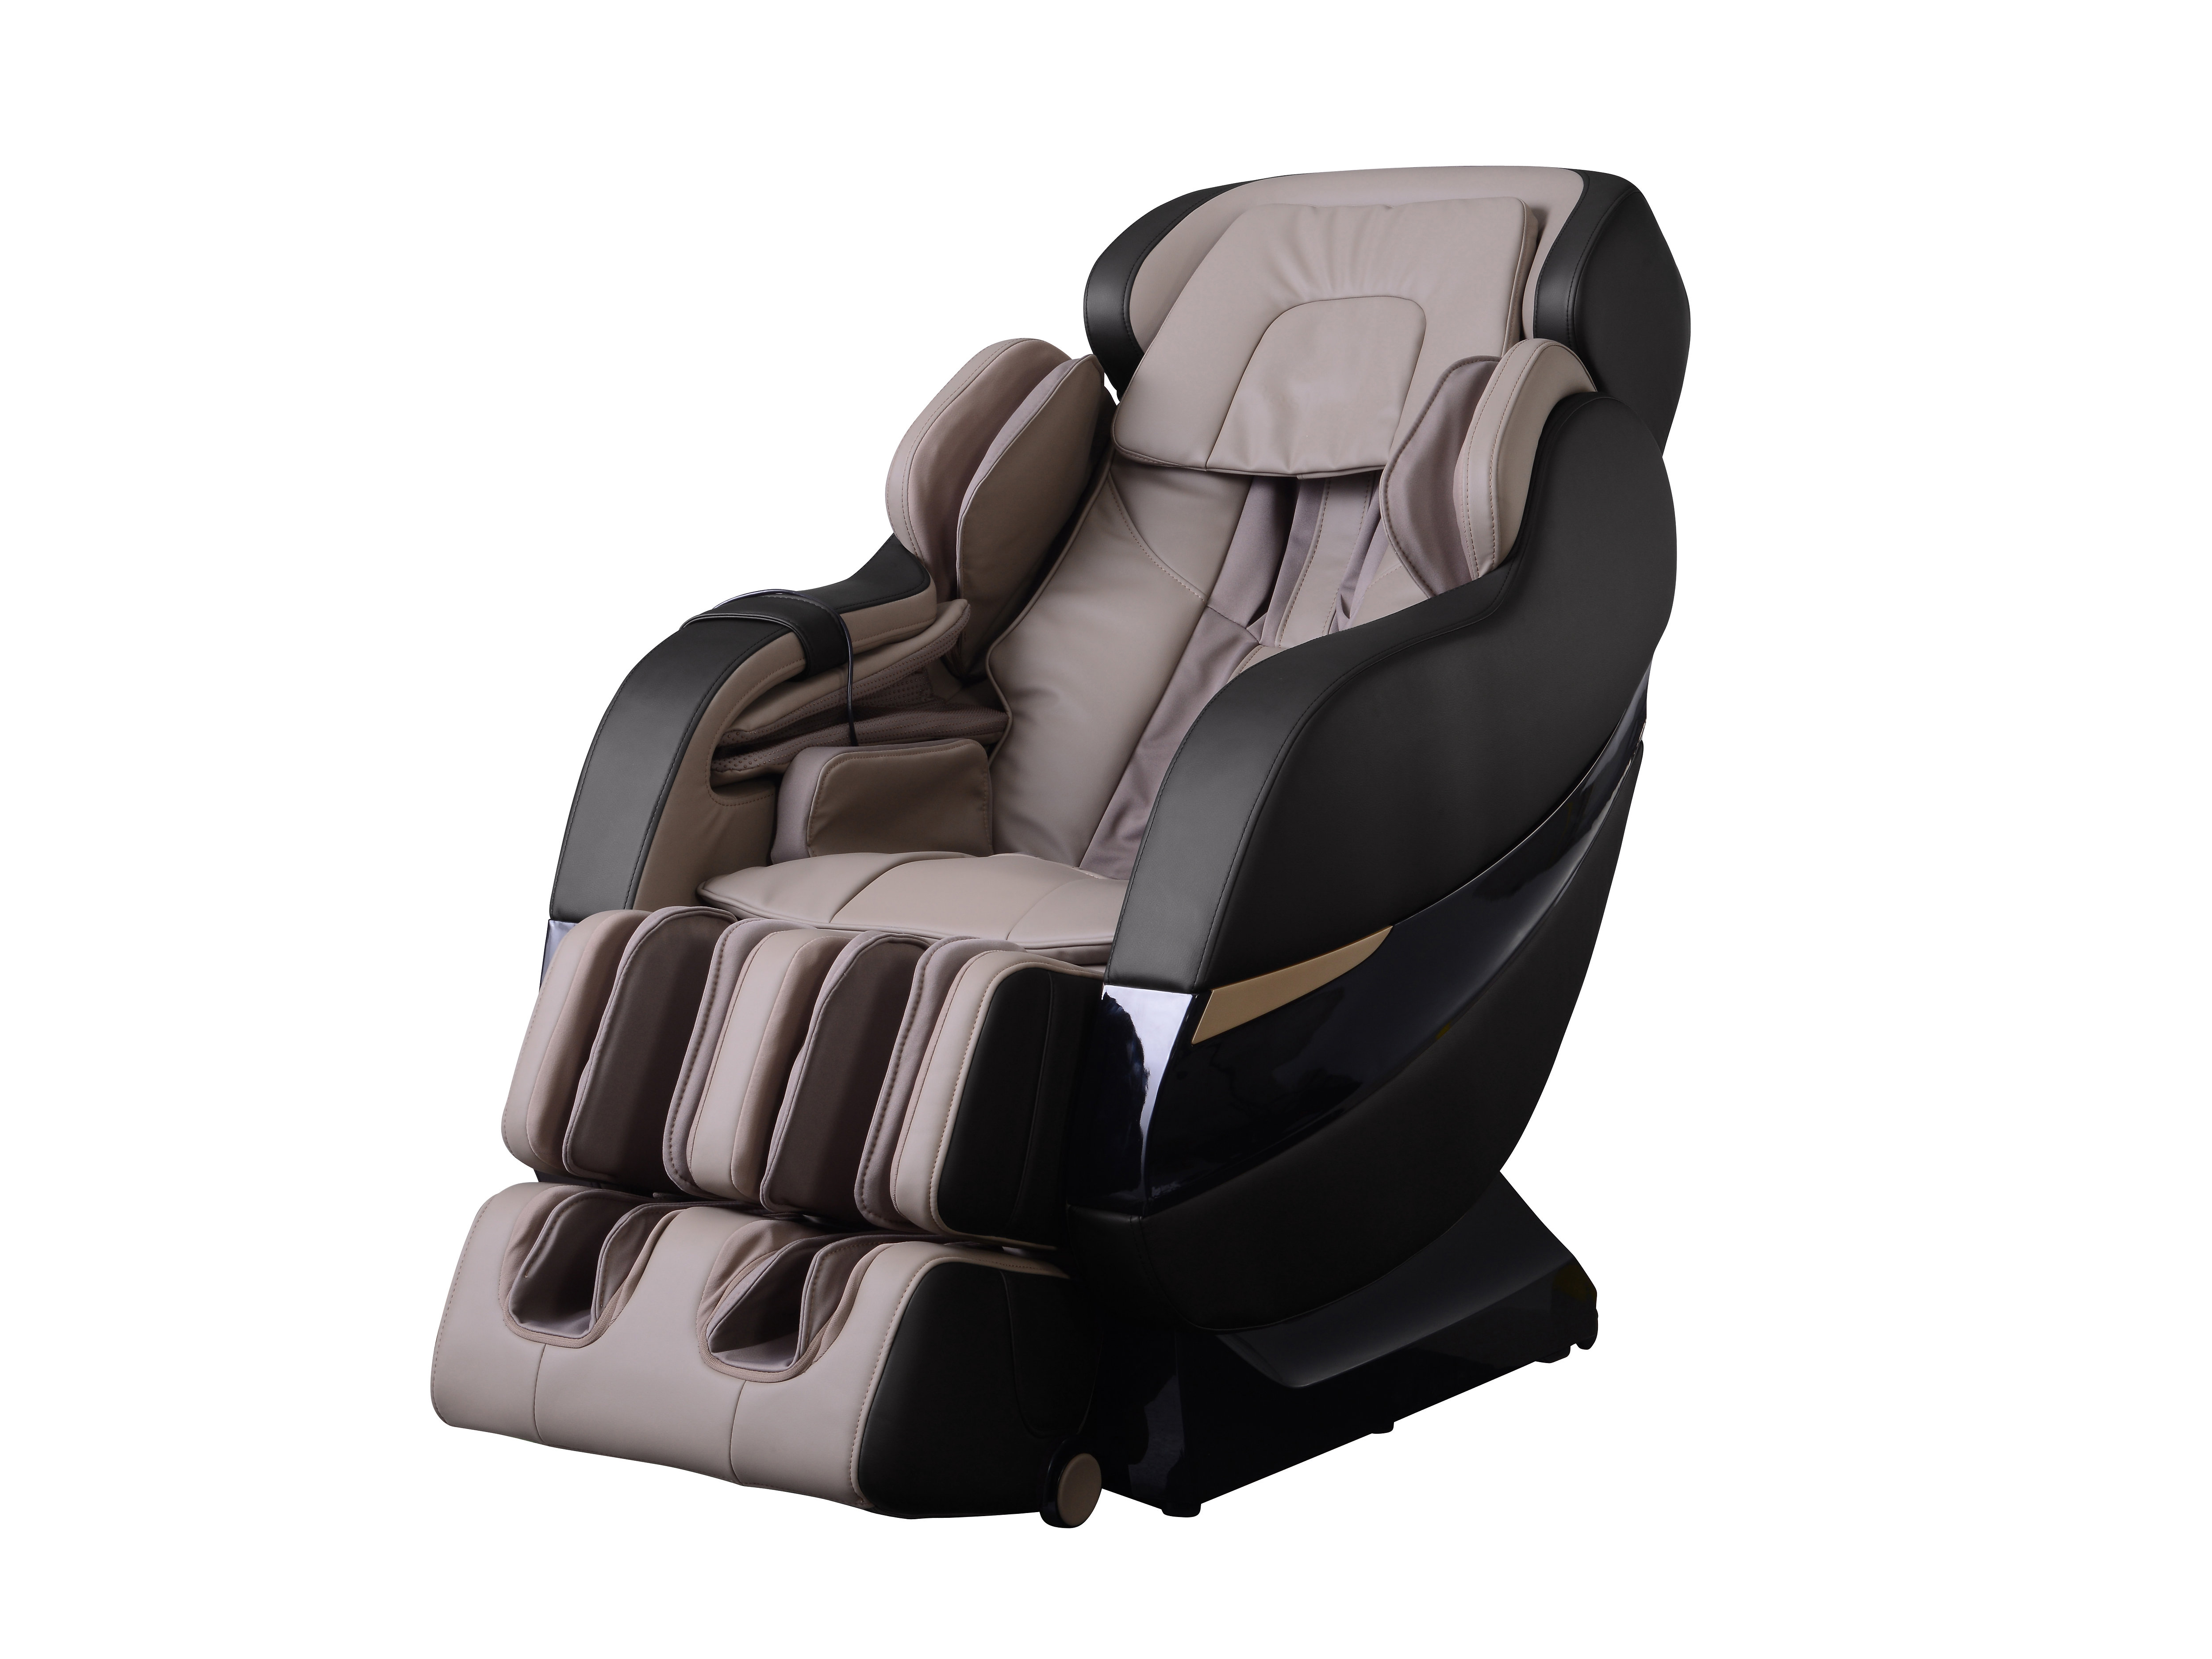 Weyron UK ficial Store Authentic Weyron Massage Chairs UK